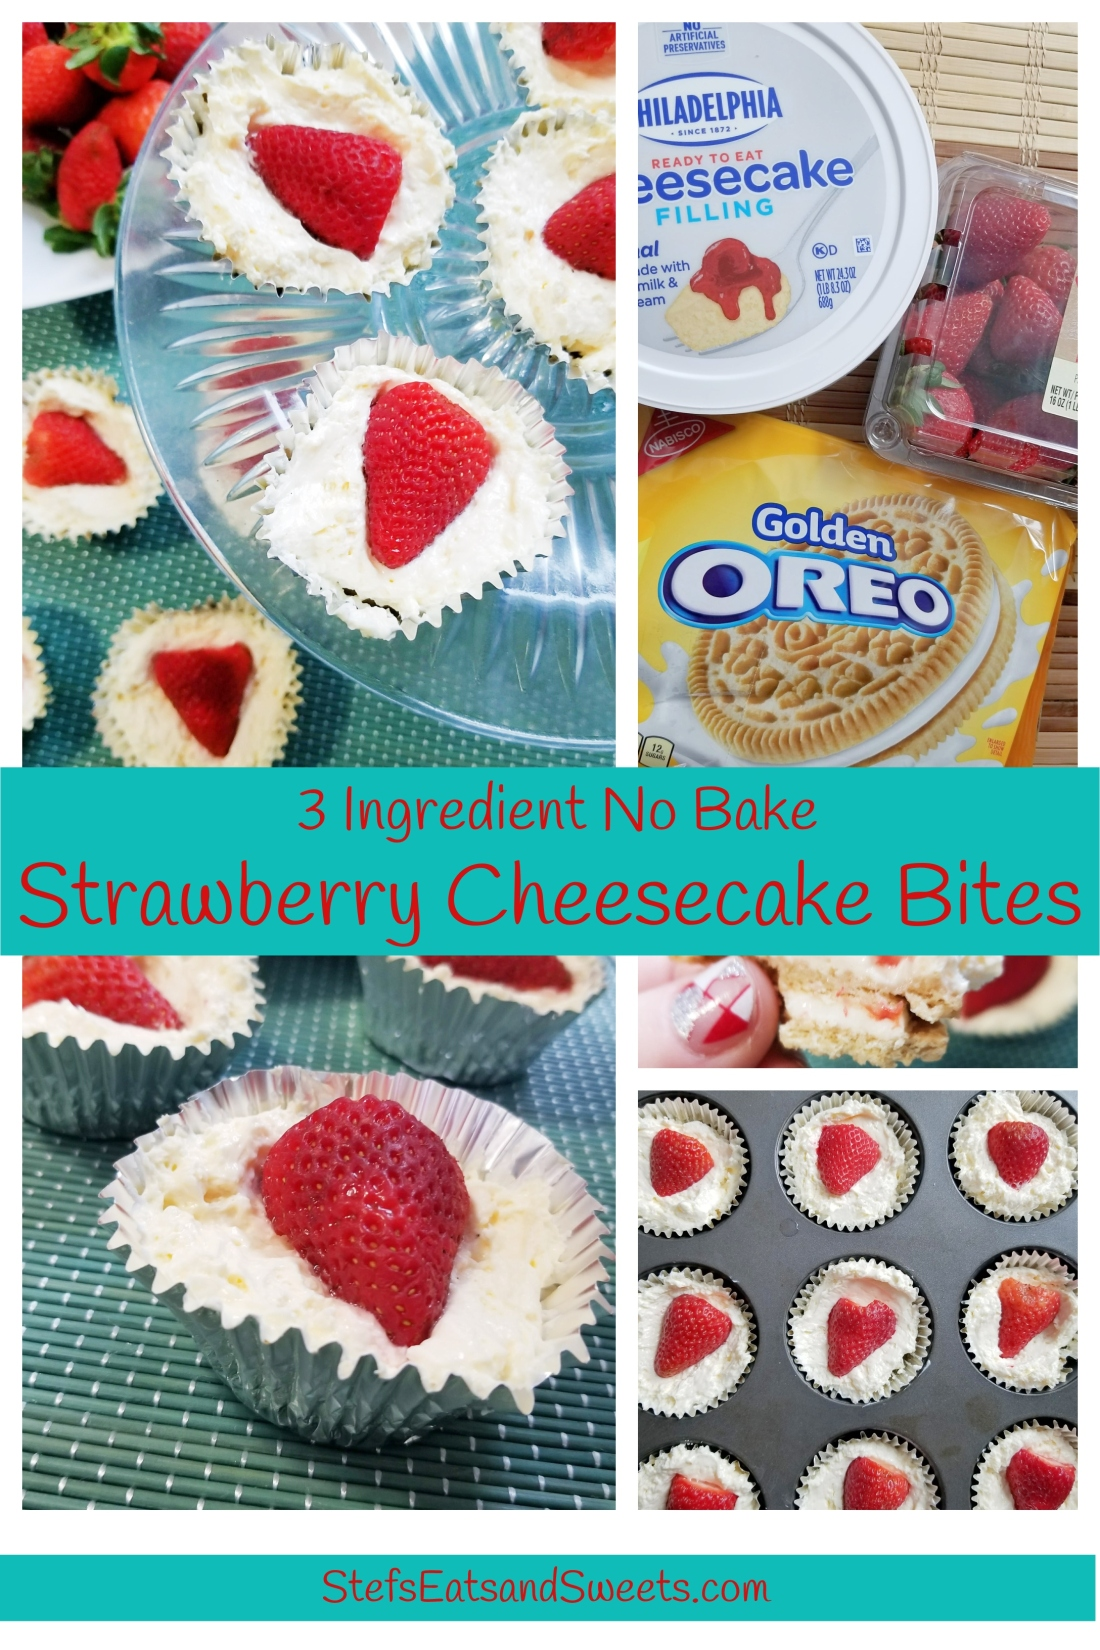 strawberry cheesecake bites collage blog.jpg